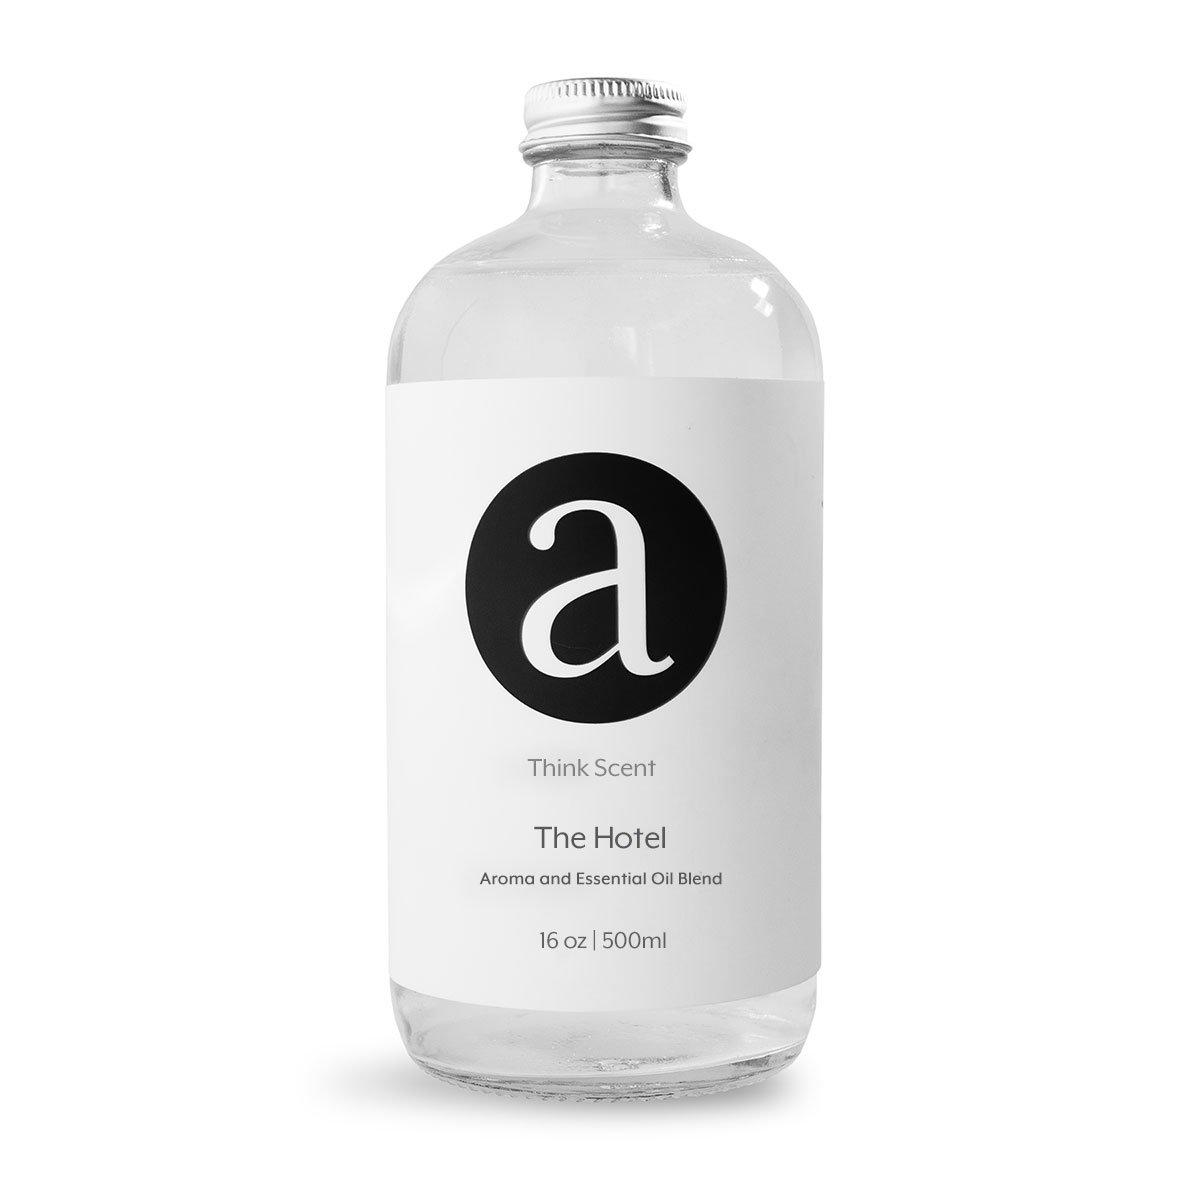 (The Hotel) Aroma / Fragrance Oil For AromaTech Air Freshener Scent Diffuser (Half Gallon)